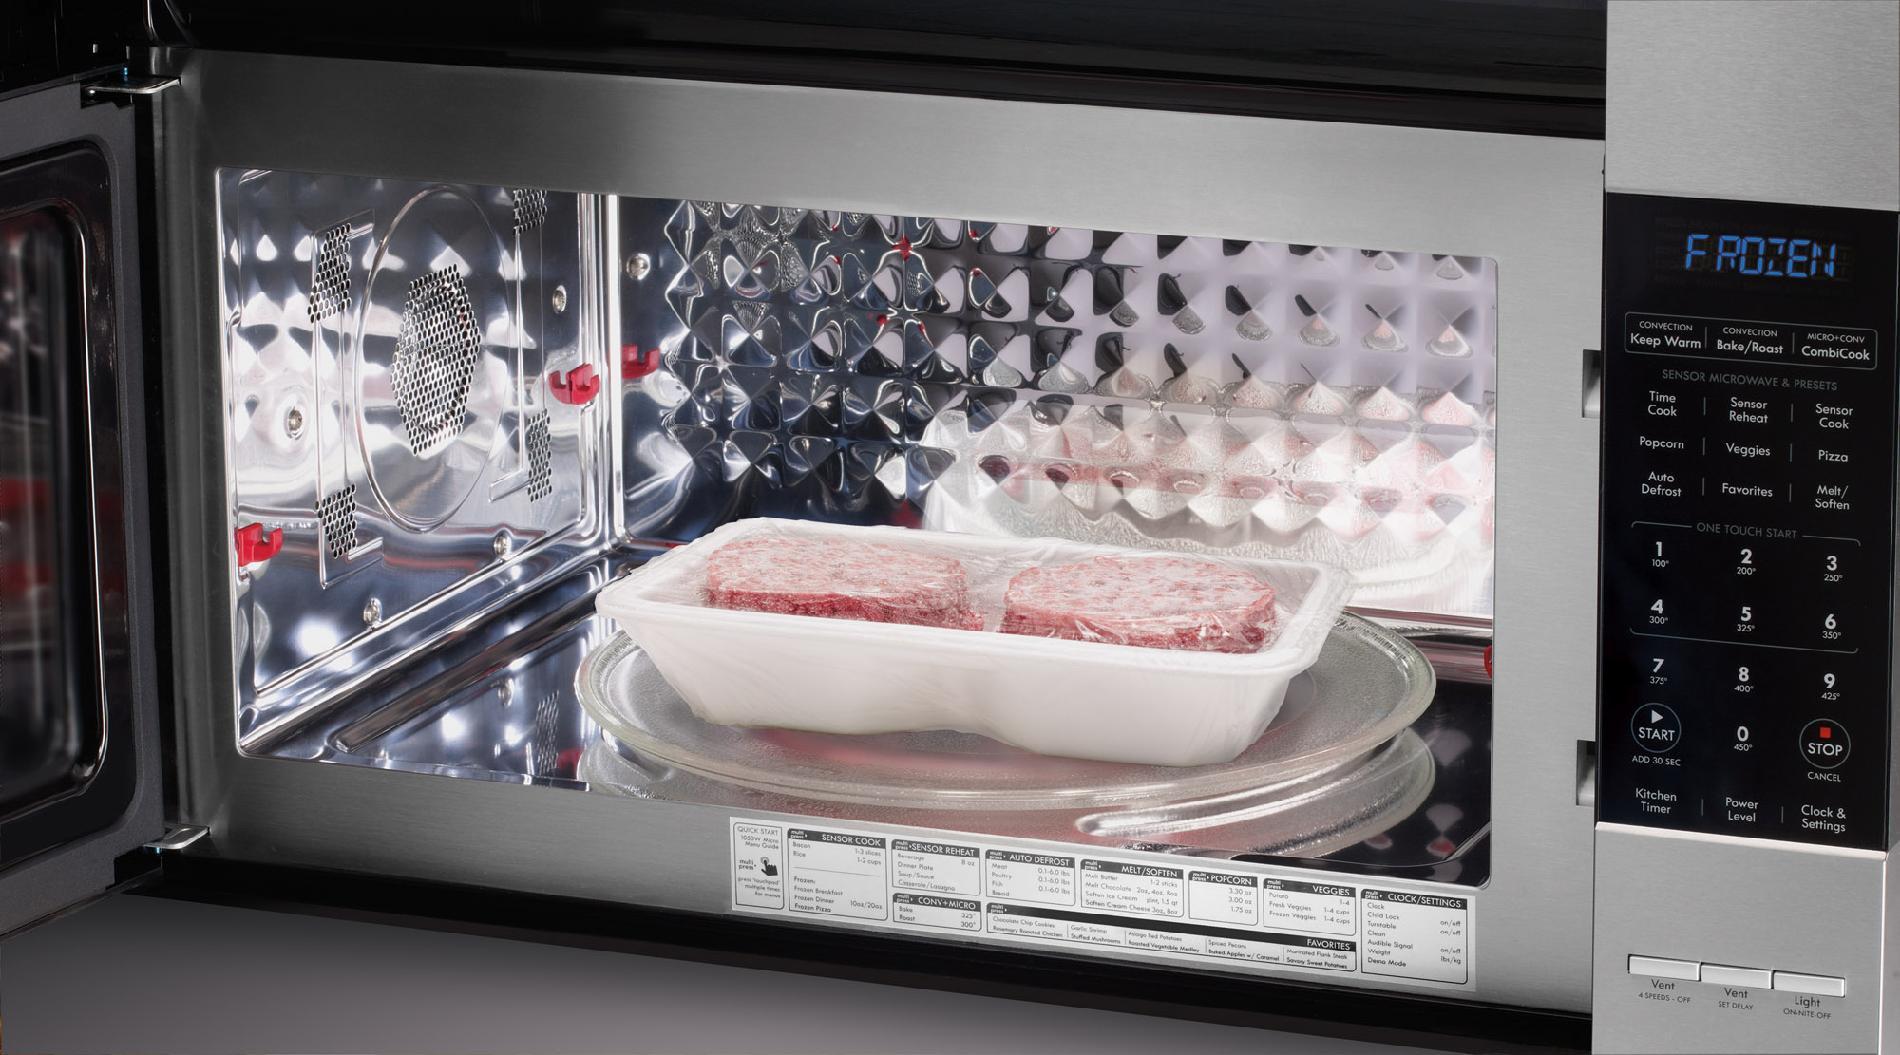 Kenmore Elite 1.8 cu ft Over-the-Range Microwave